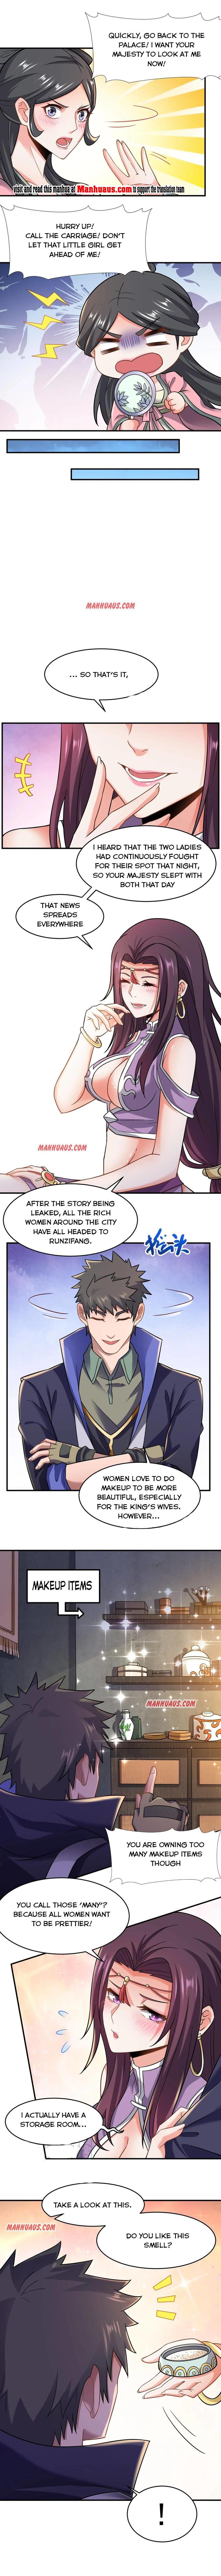 Yuanlong Chapter 159 page 4 - Mangakakalots.com